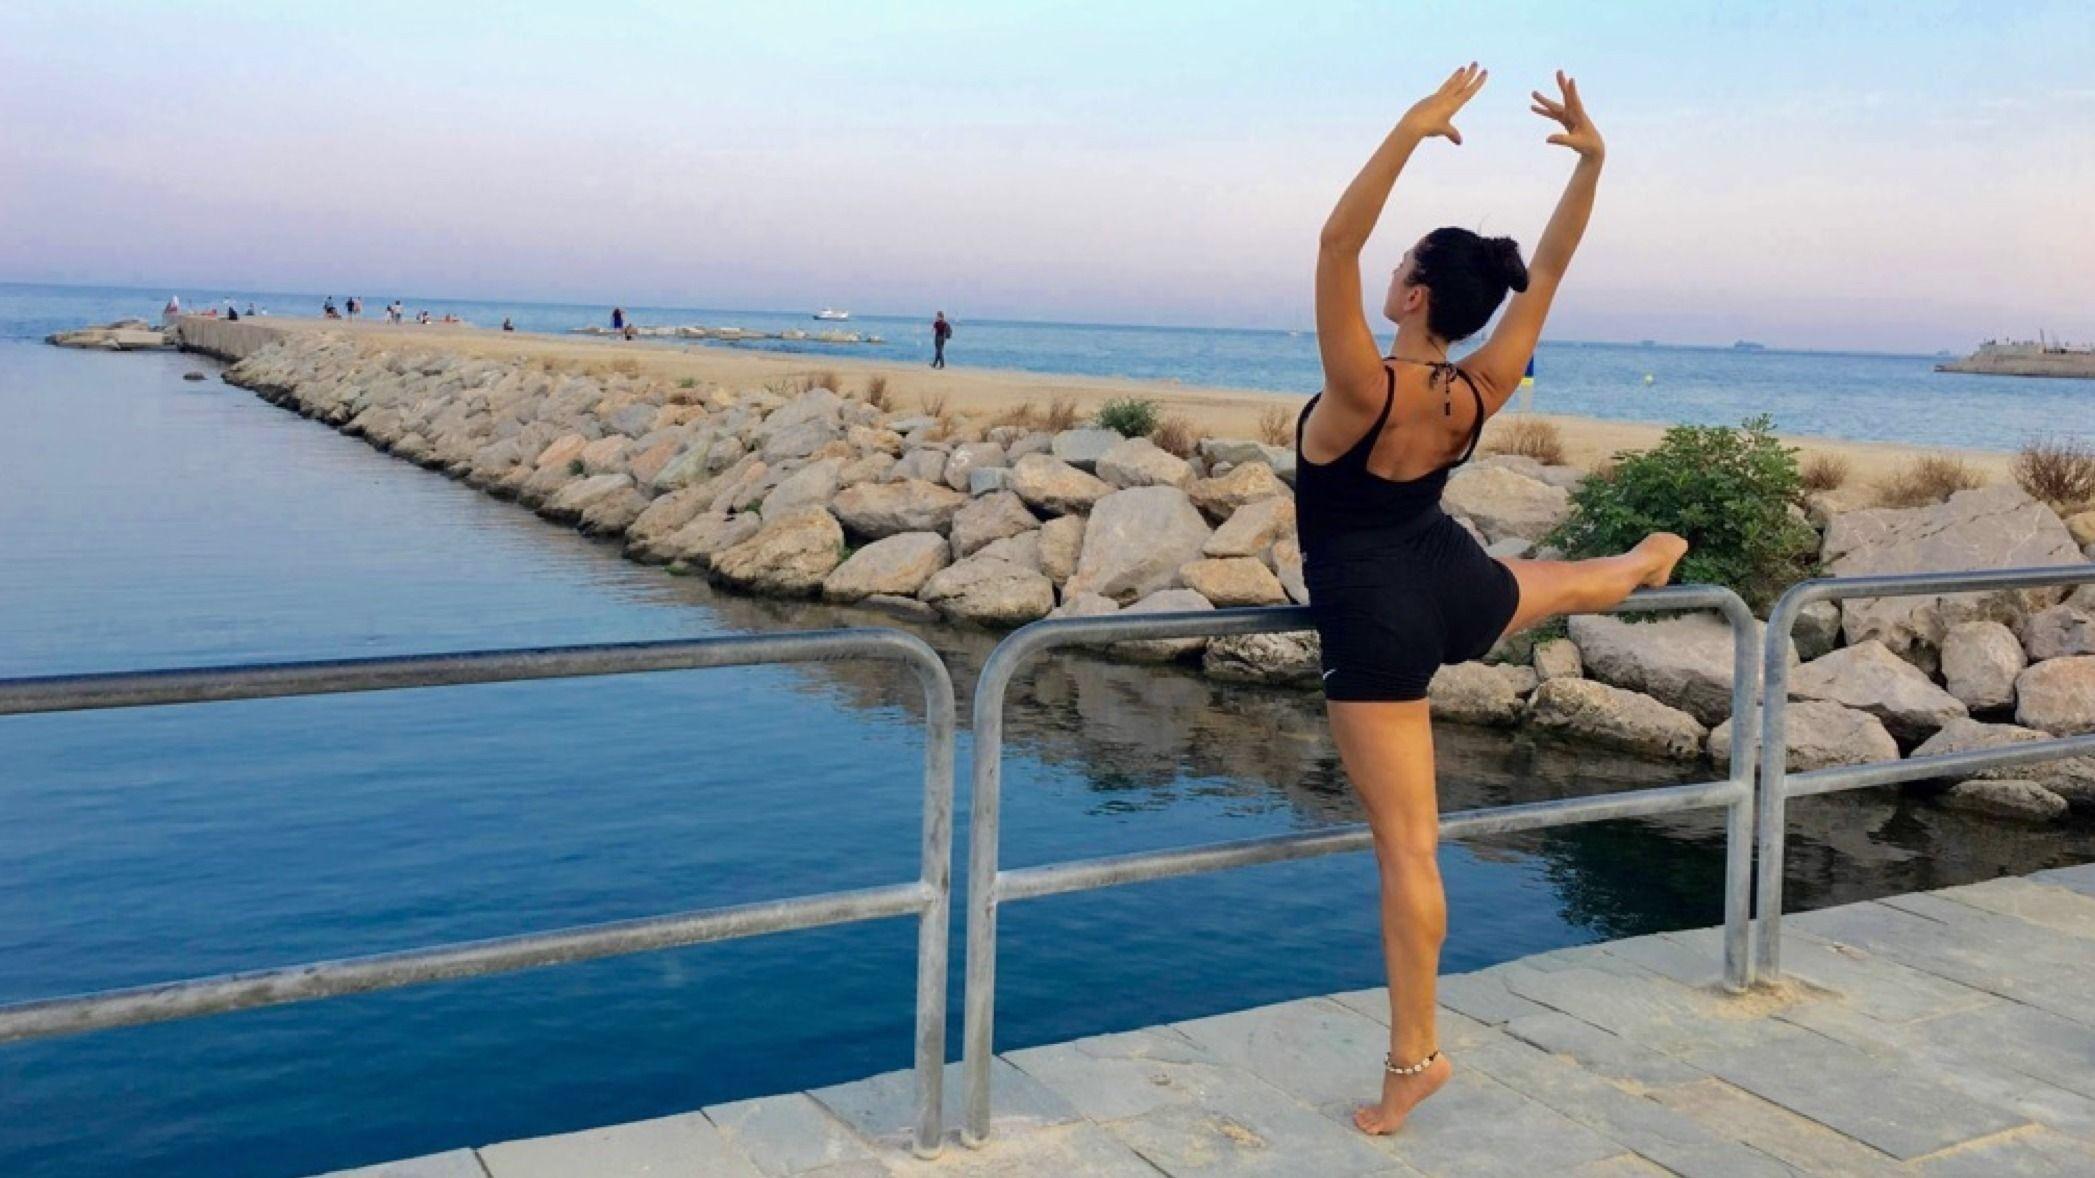 Barre Ballet Fit & Yoga, at the Beach/ en la playa